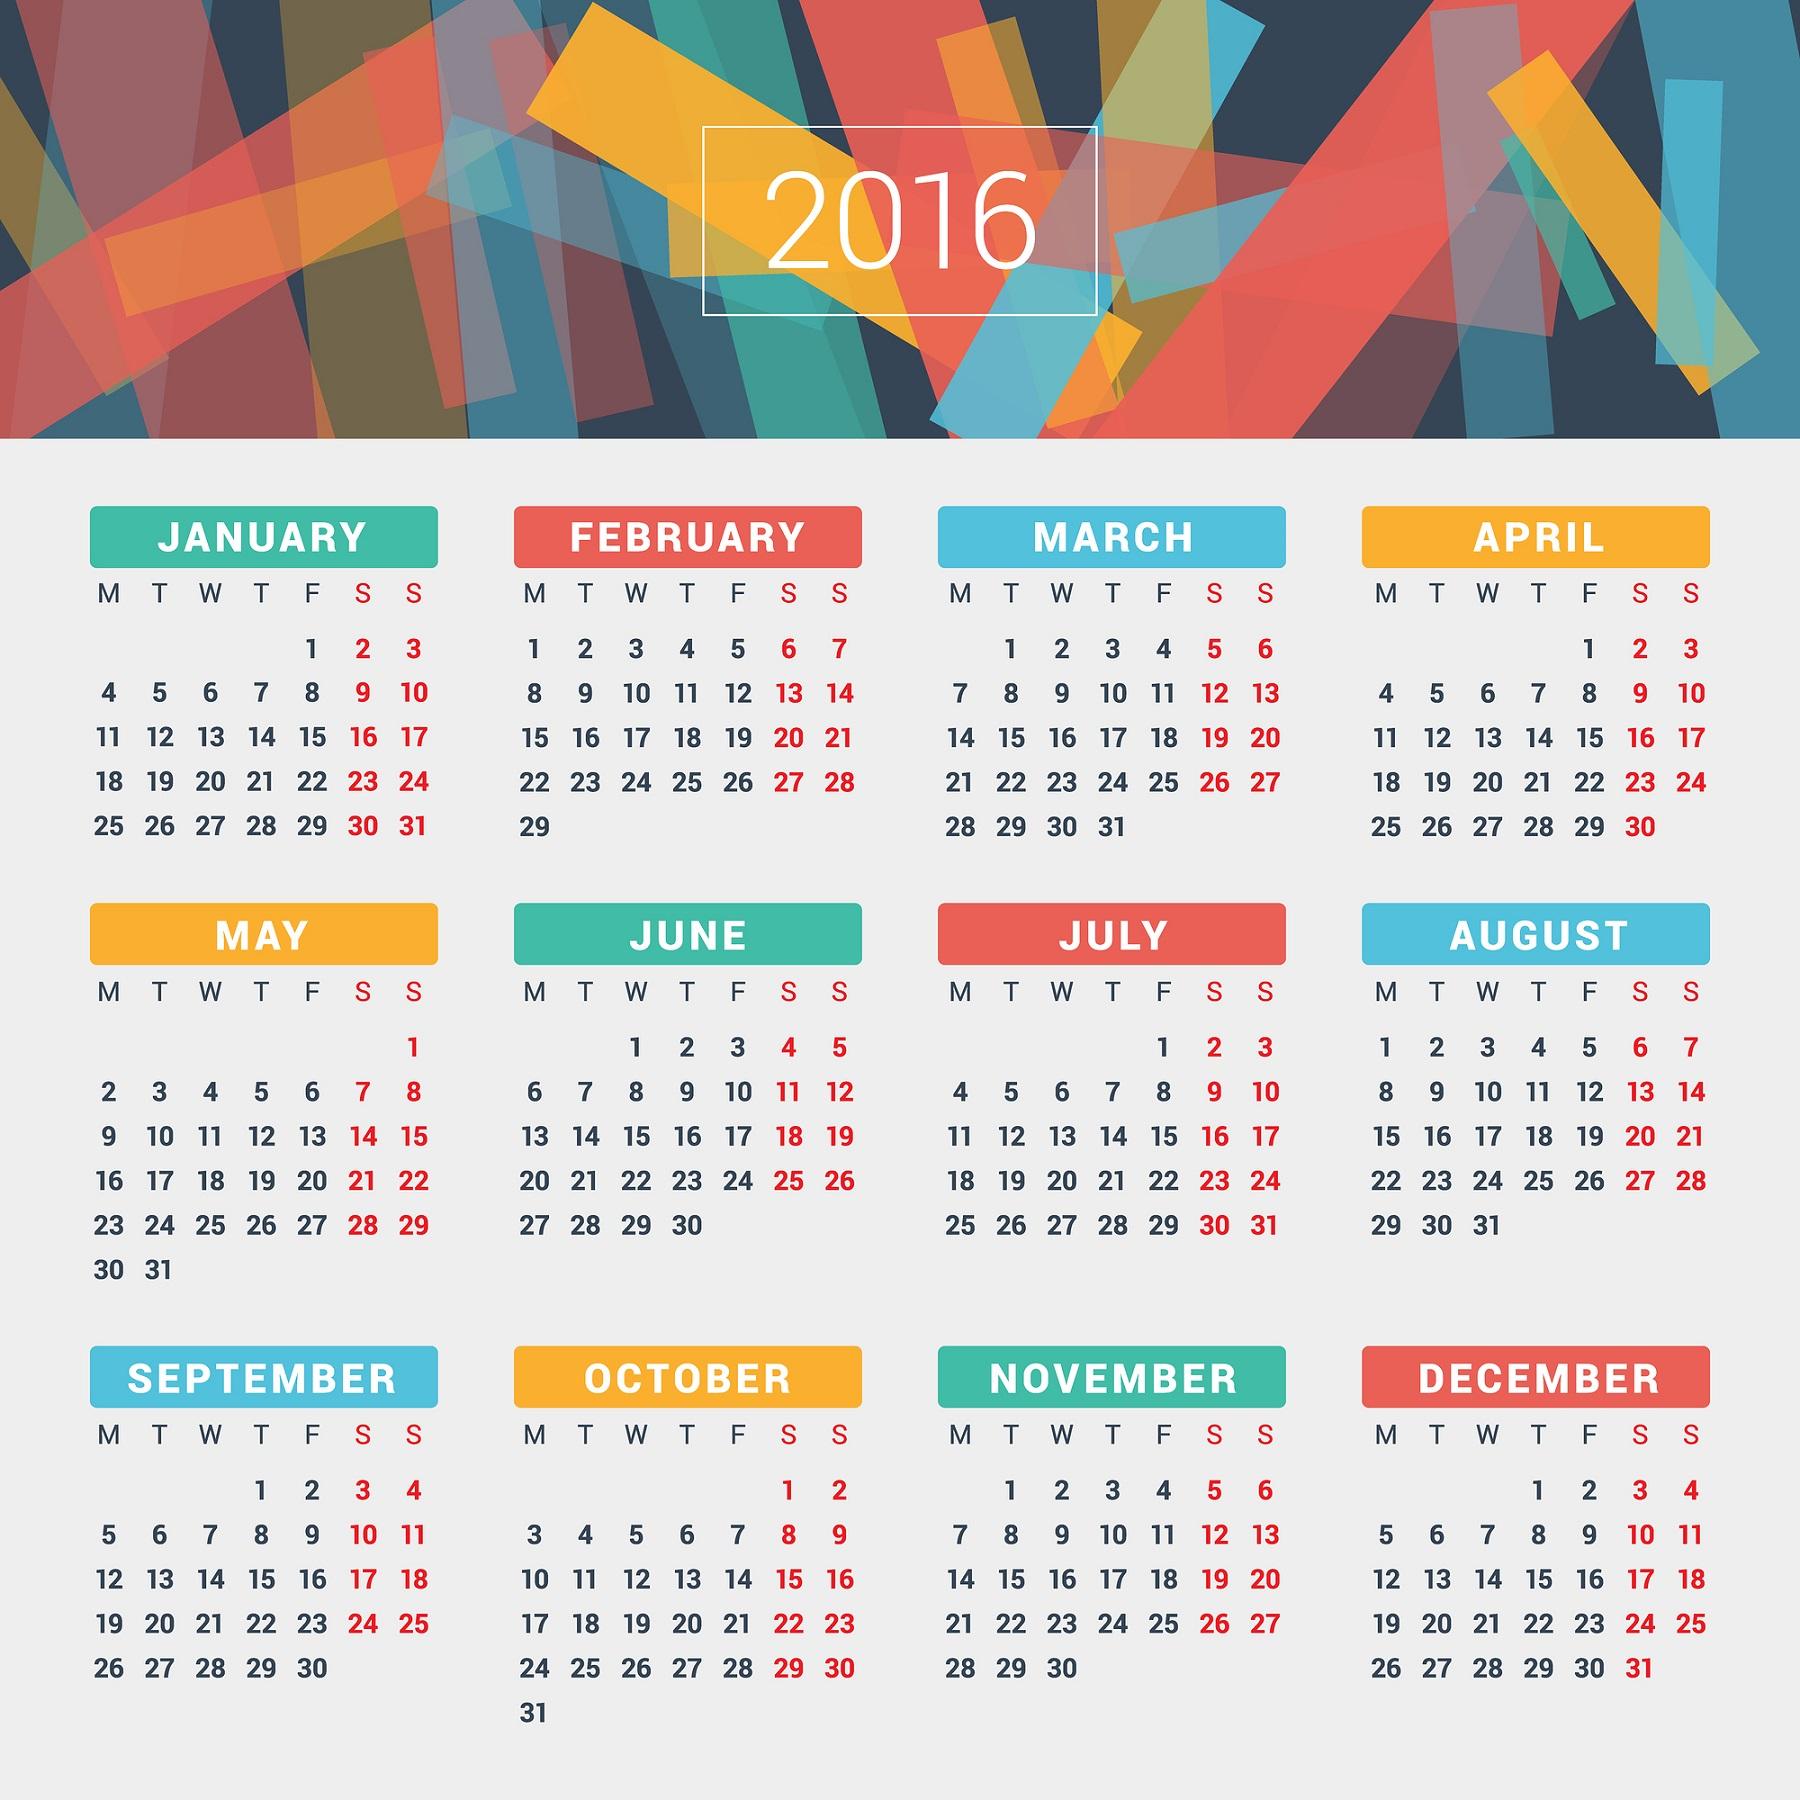 2016 Calendar fullcolour